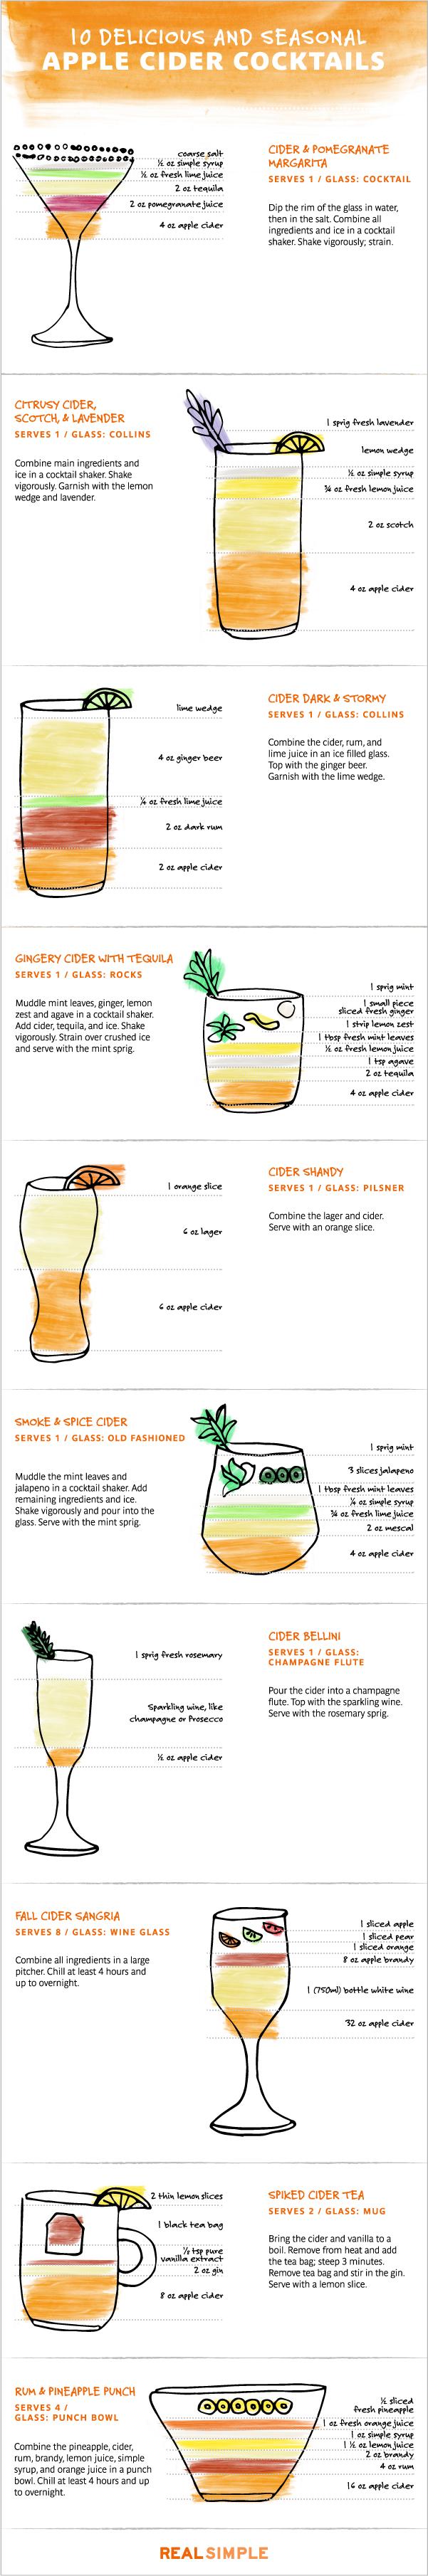 apple cider infographic